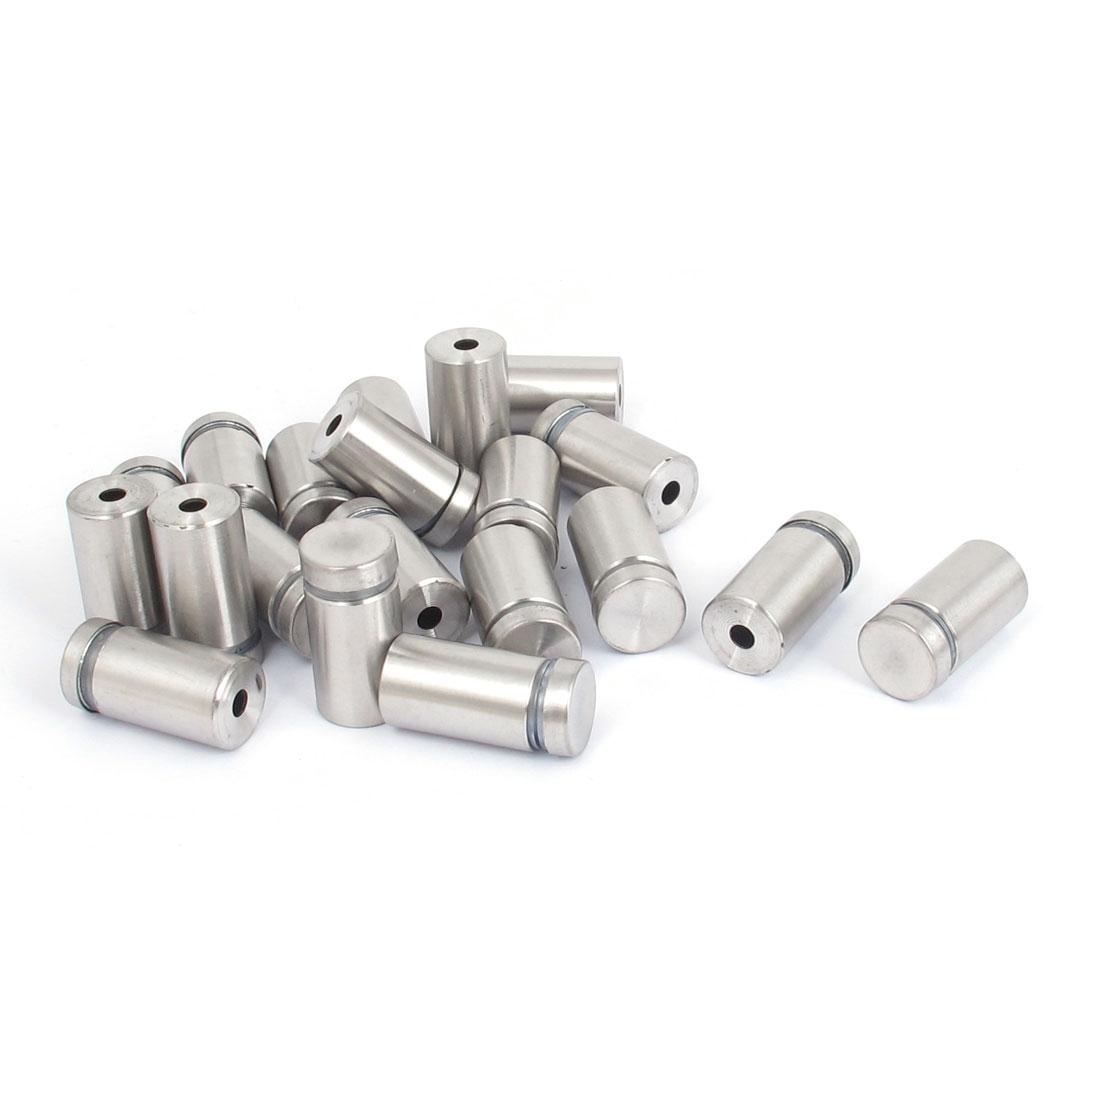 16mm x 30mm Stainless Steel Advertising Frameless Glass Standoff Pins 20pcs